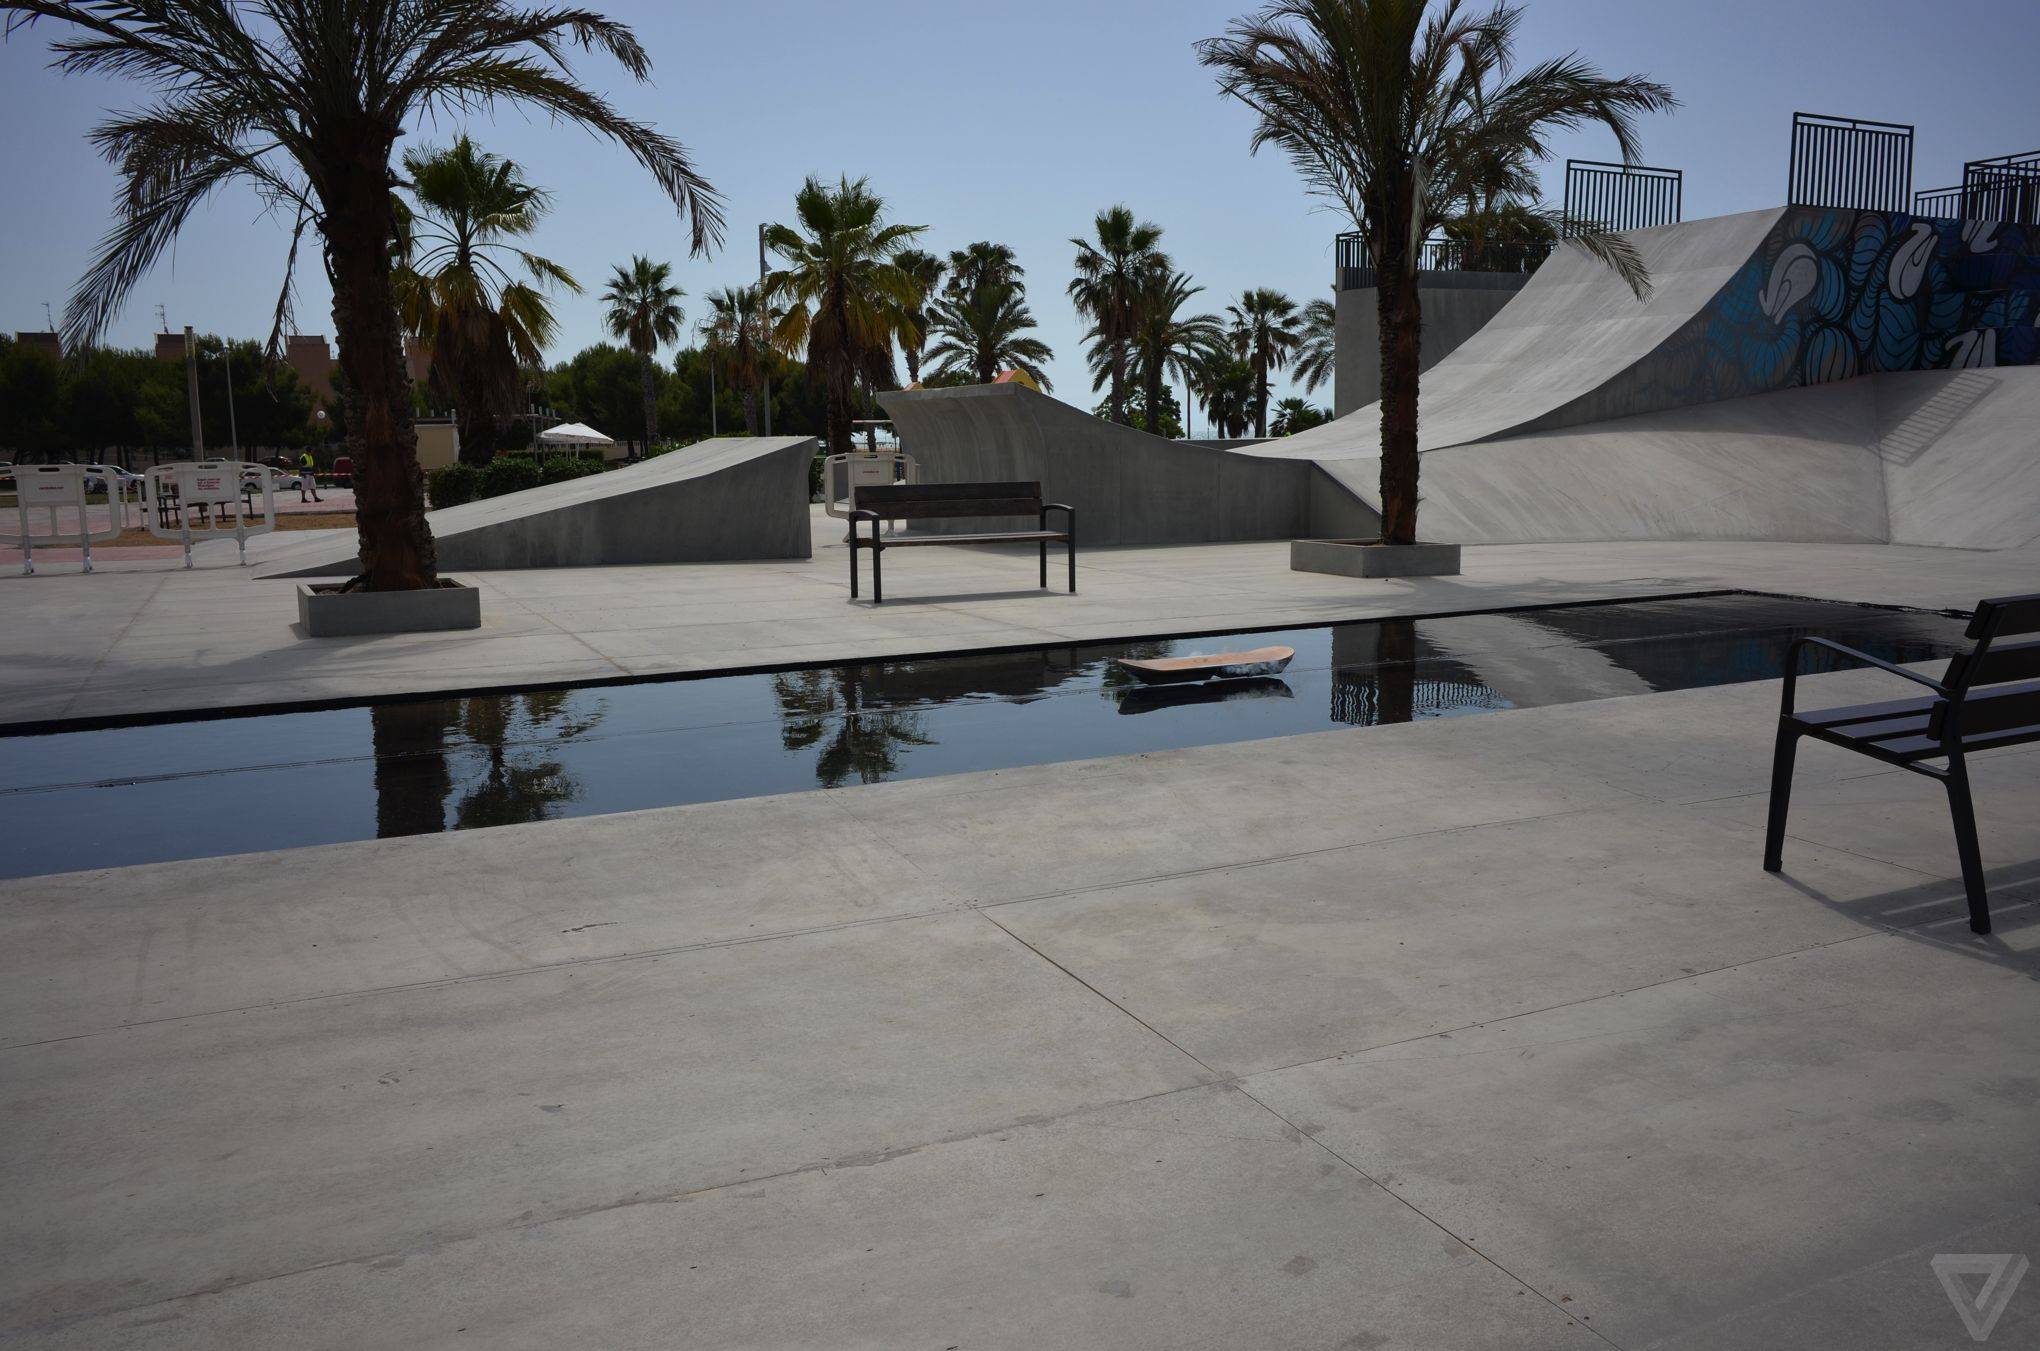 lexus-hoverboard-park